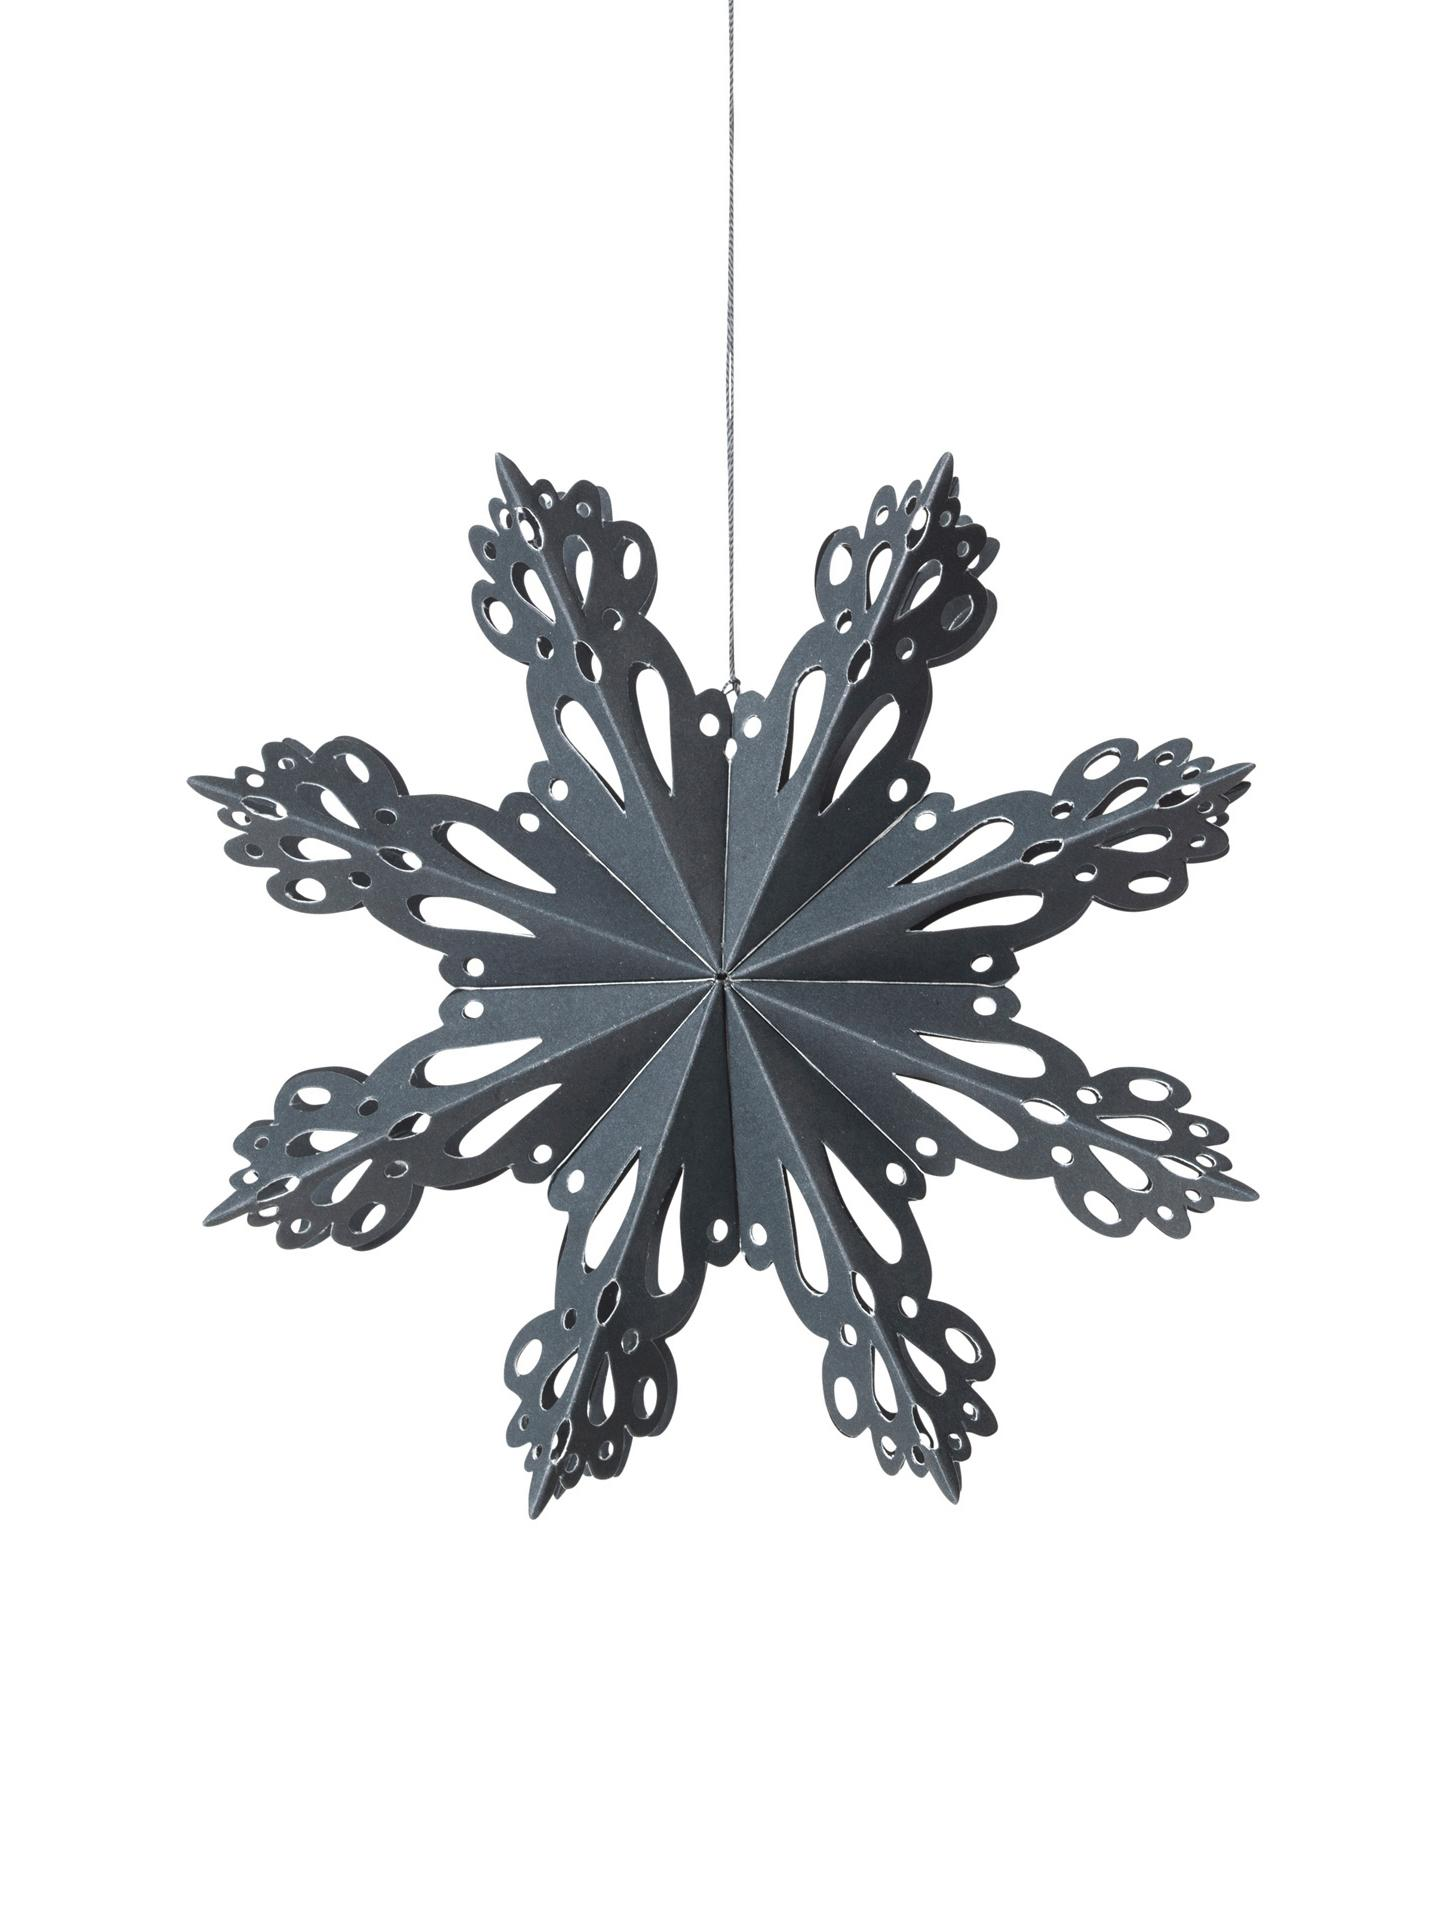 Baumanhänger Snowflake, 2 Stück, Papier, Graublau, Ø 15 cm